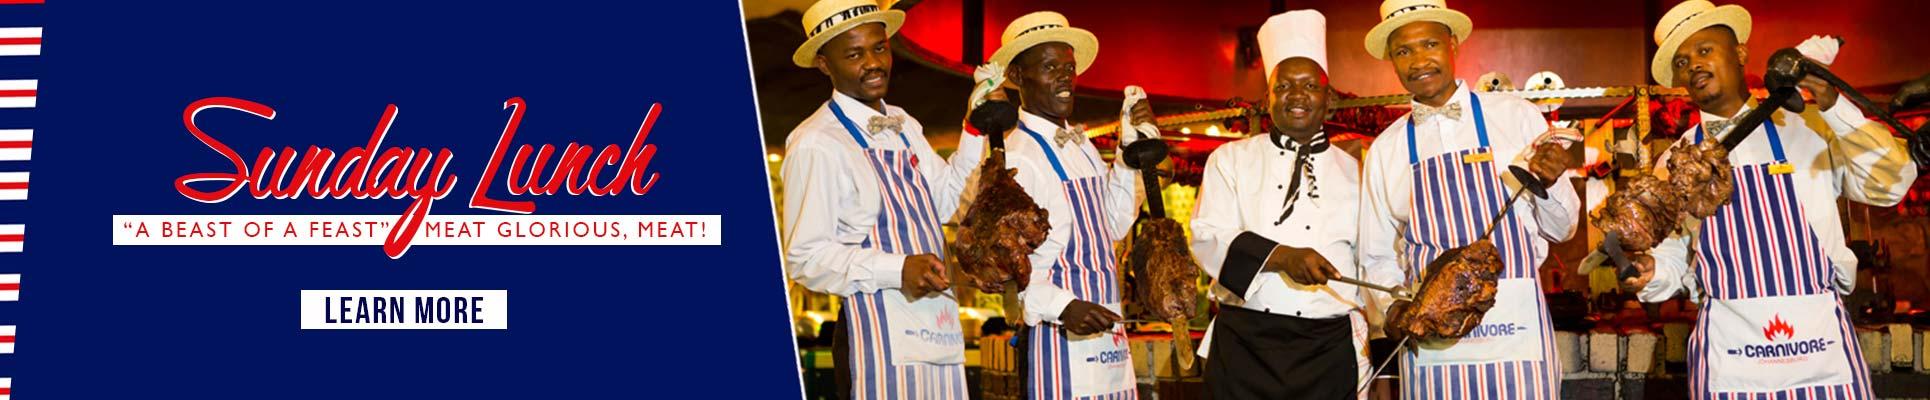 Carnivore Restaurant Sunday Lunch in Muldersdrift Gauteng